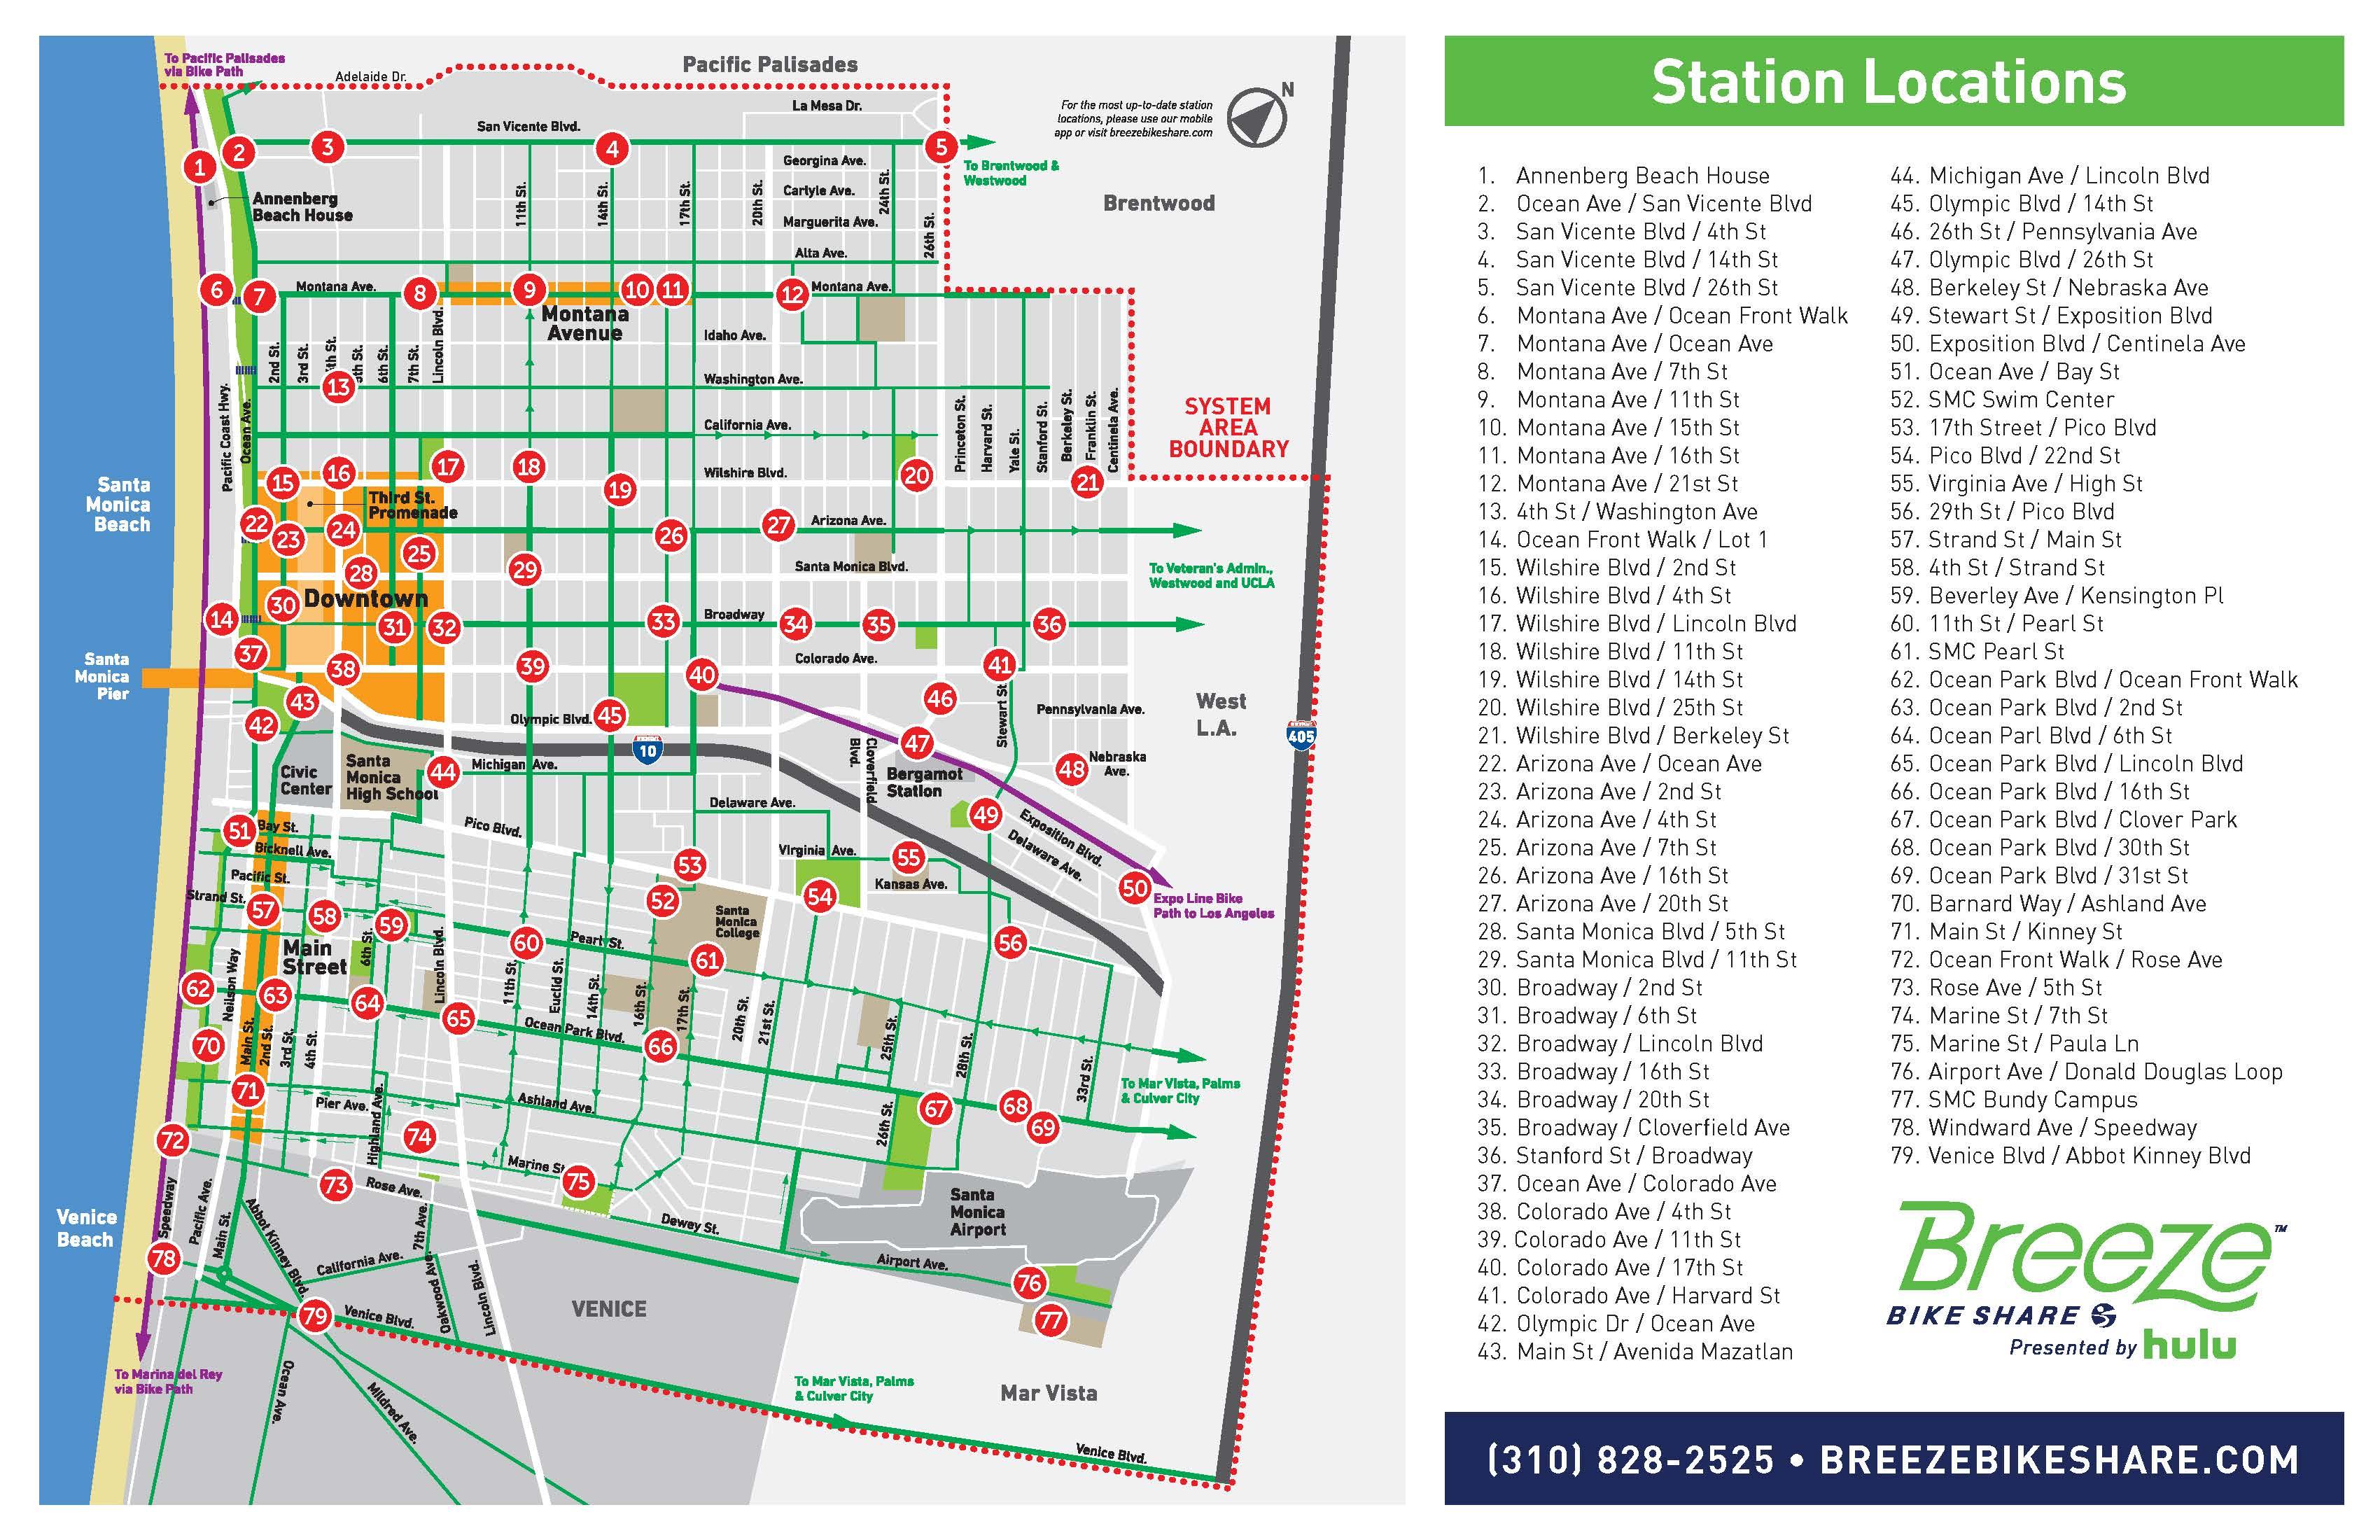 Bike Share Planning  Community Development City Of Santa Monica - Los angeles zoning map